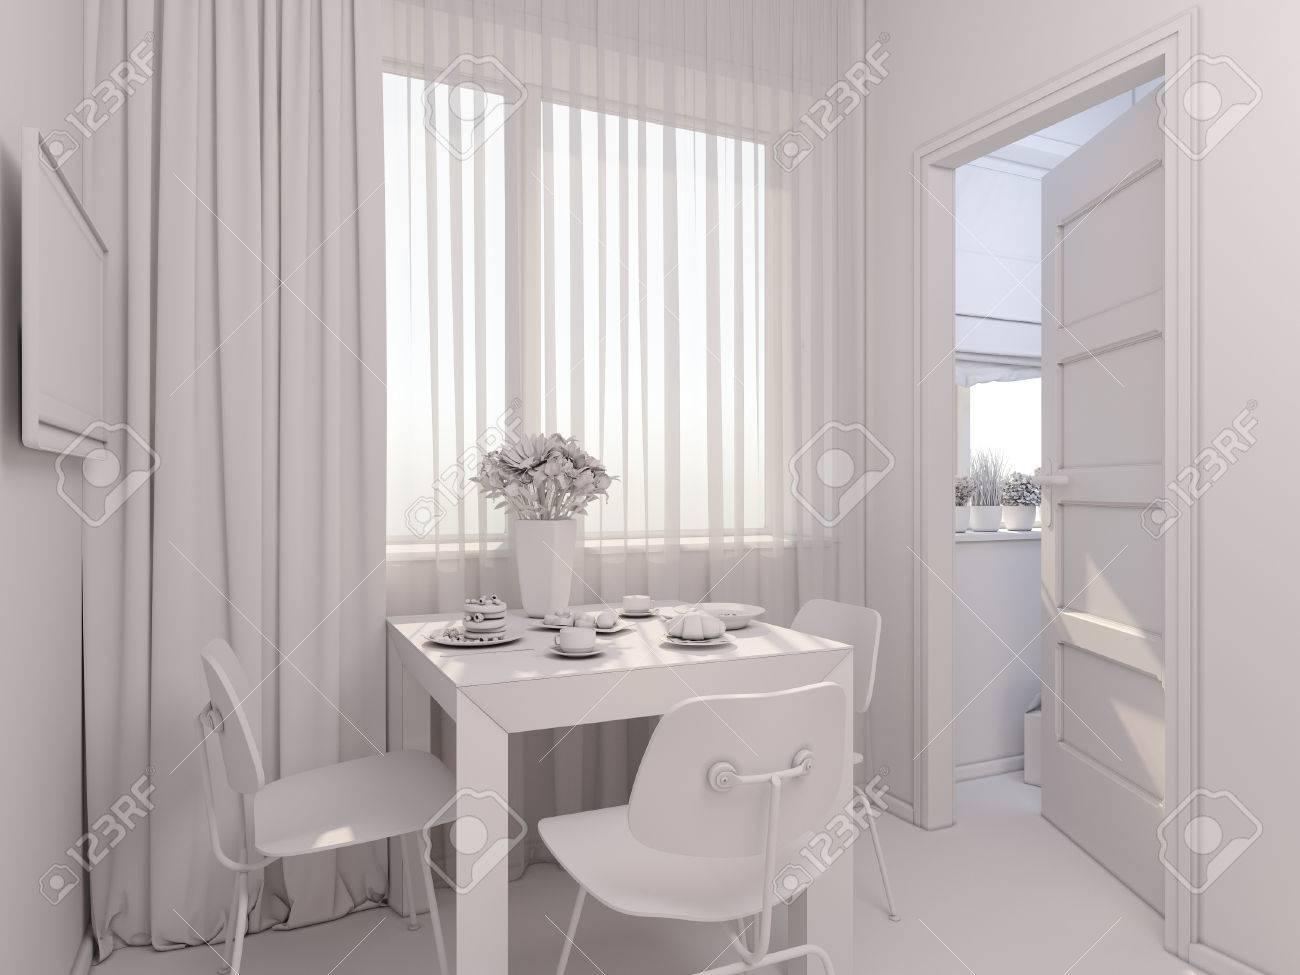 3D Render Of Interior Design Kitchen In A Studio Apartment In ...